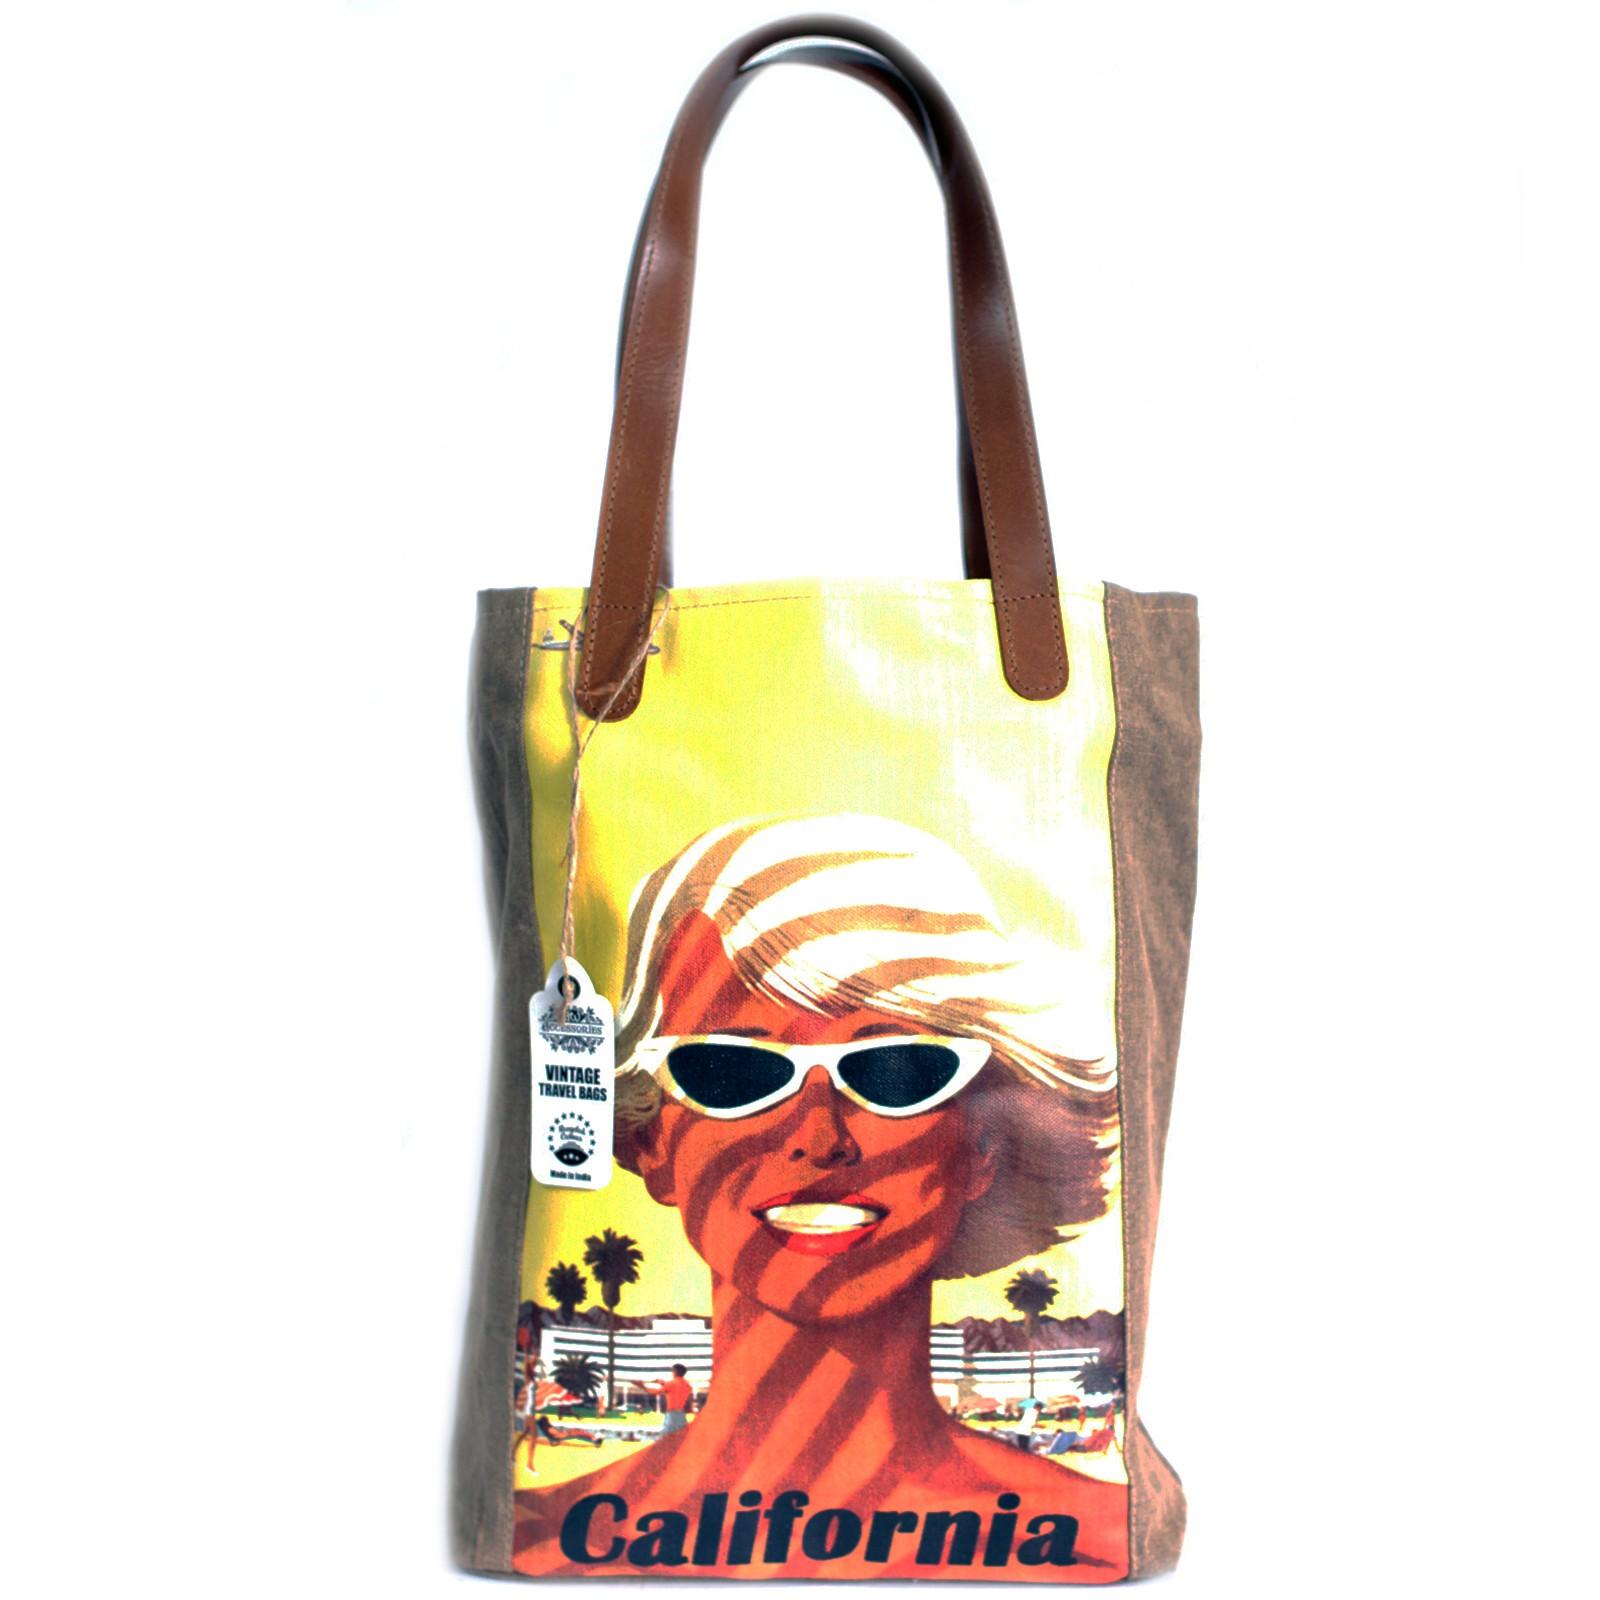 Vintage Travel Bag - California